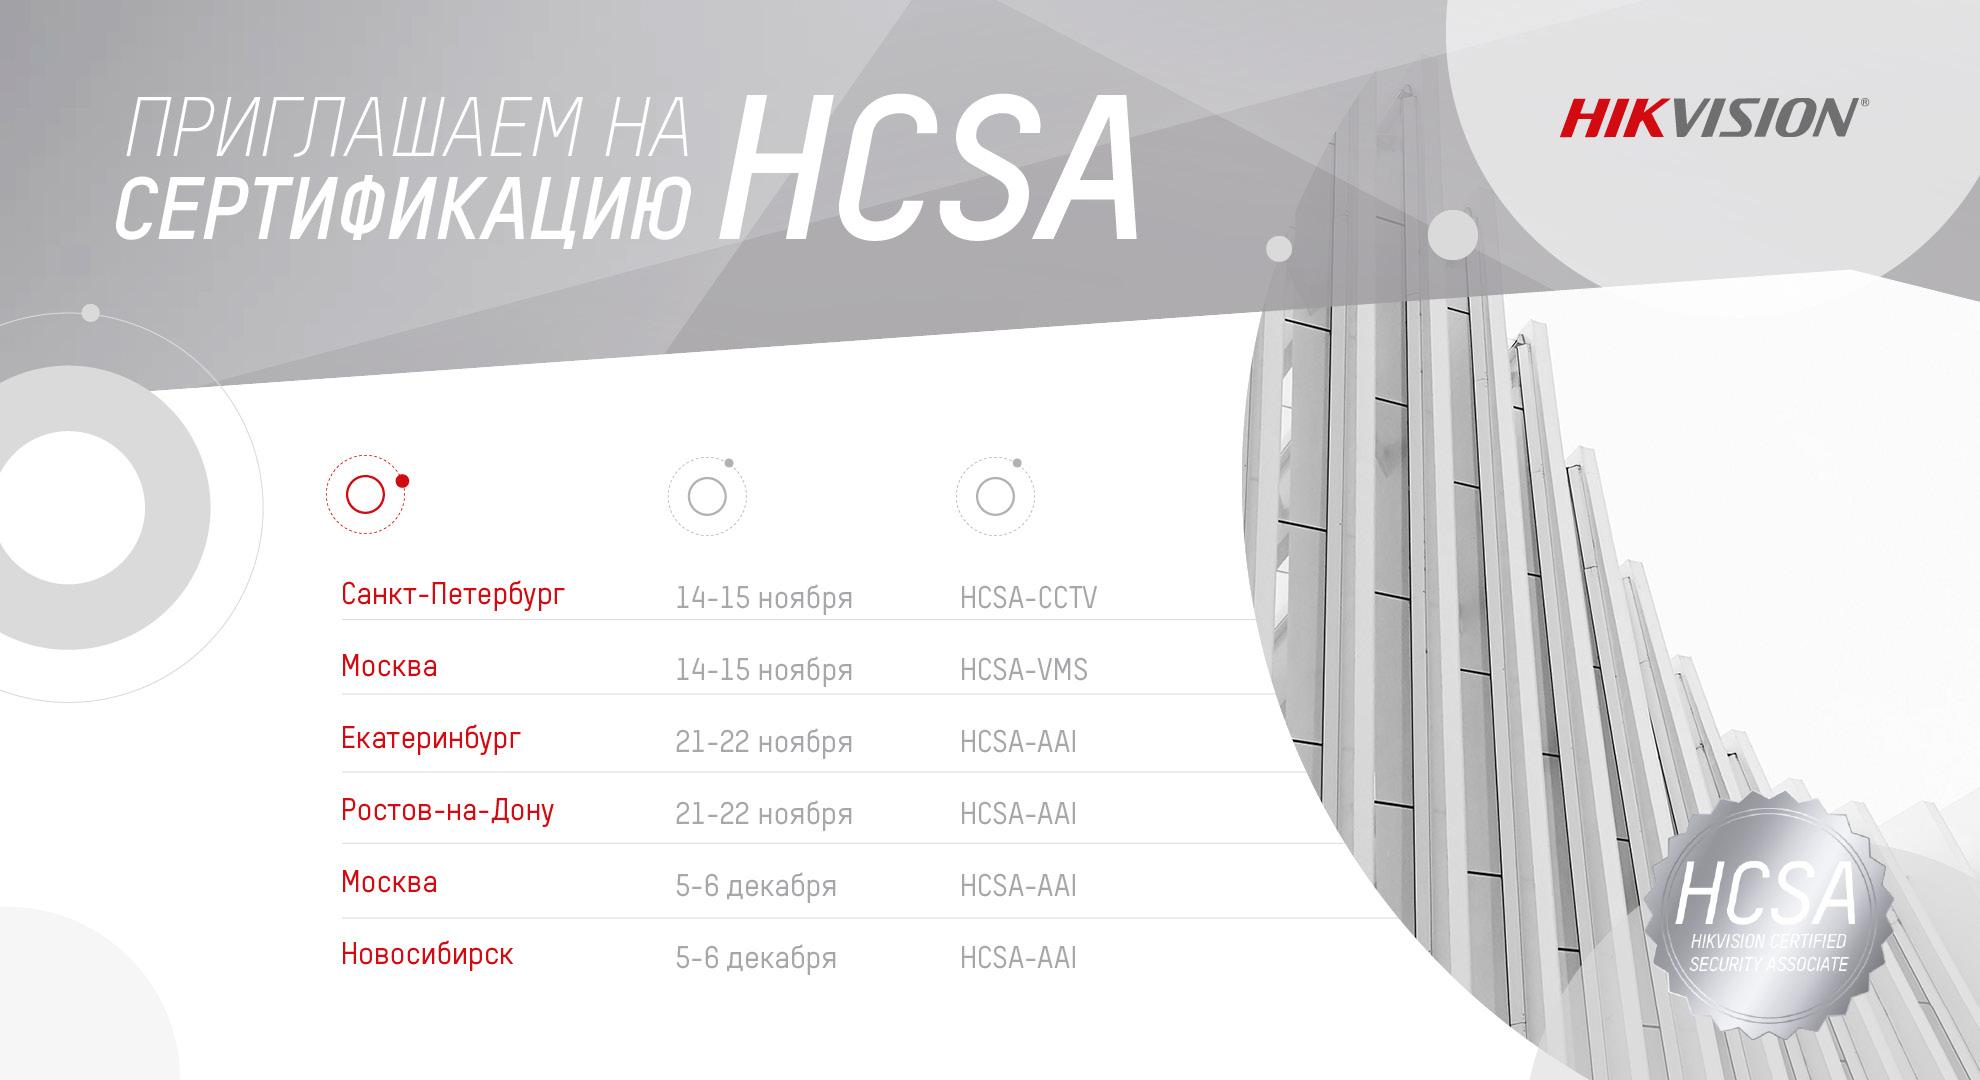 hcsa_e-mail_fb3